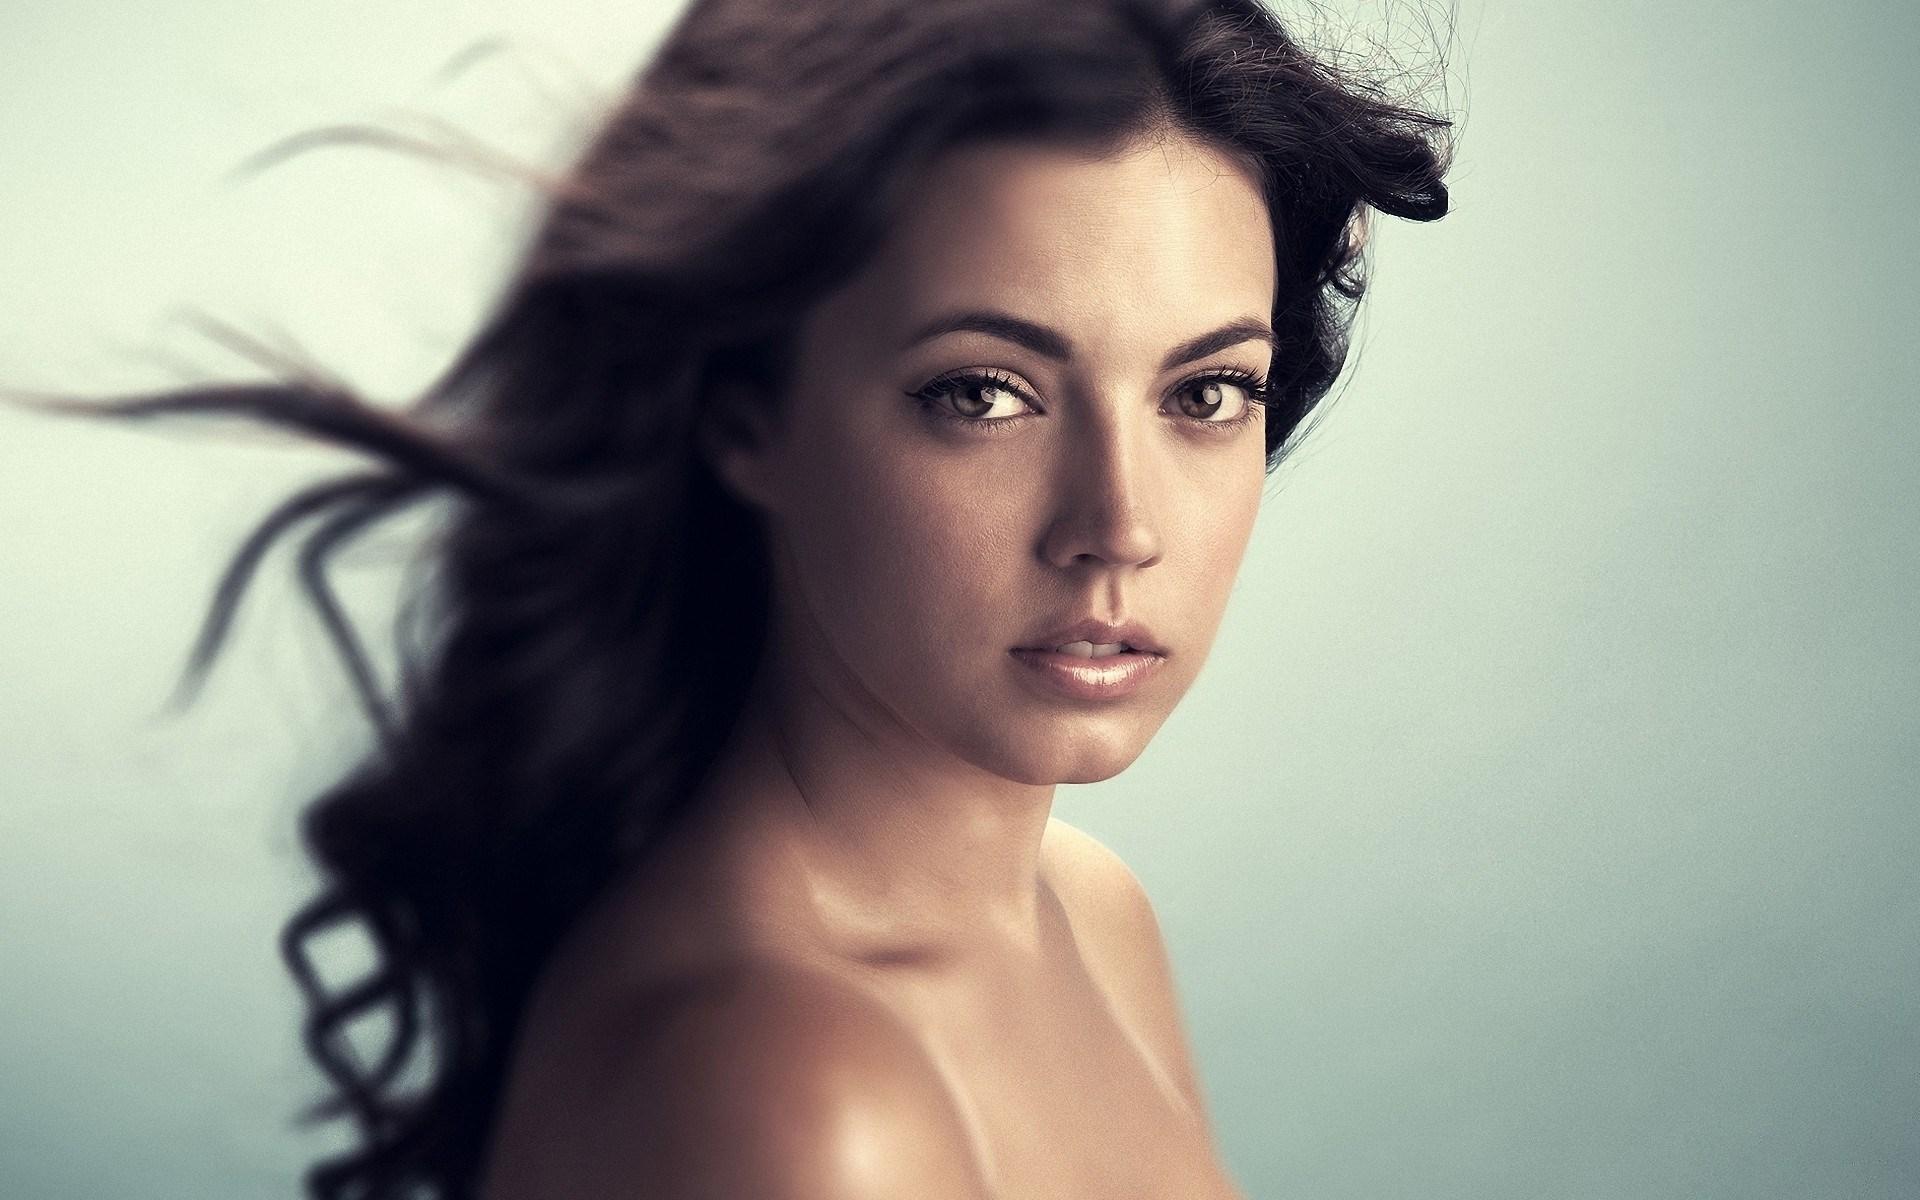 Brunette Close-Up Girl Portrait